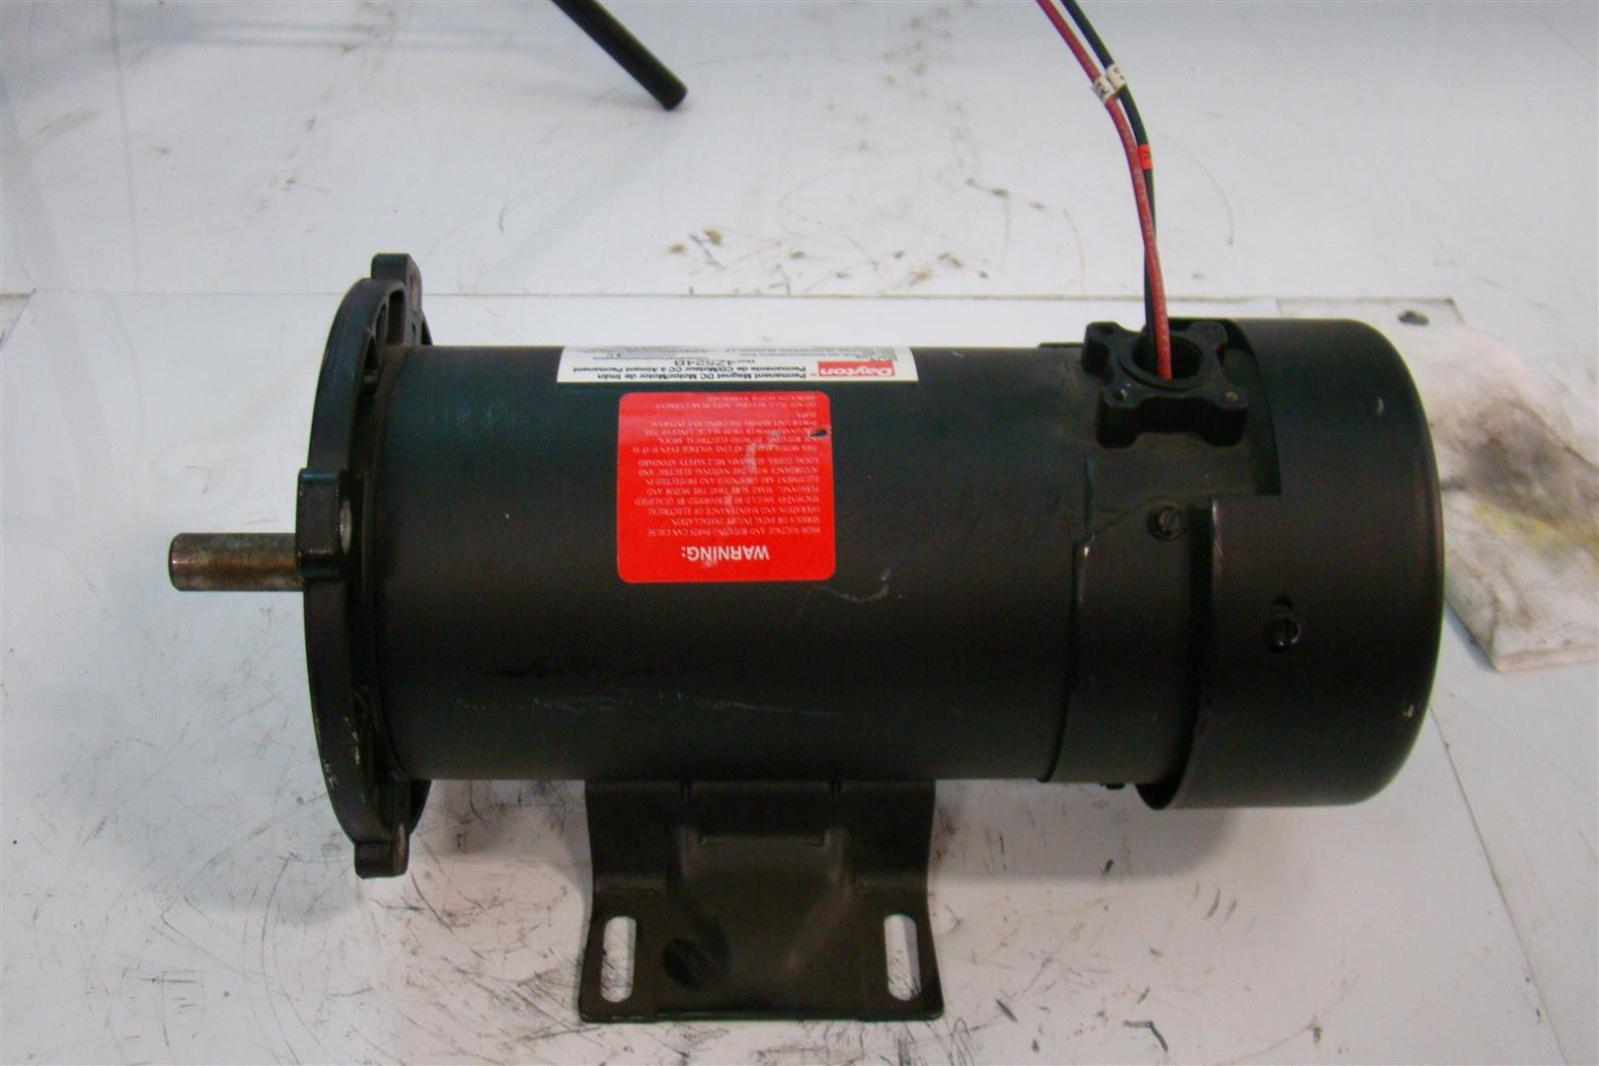 Dayton Permanent Magnet Dc Motor 1 2 Hp 1725 Rpm 180 Vdc